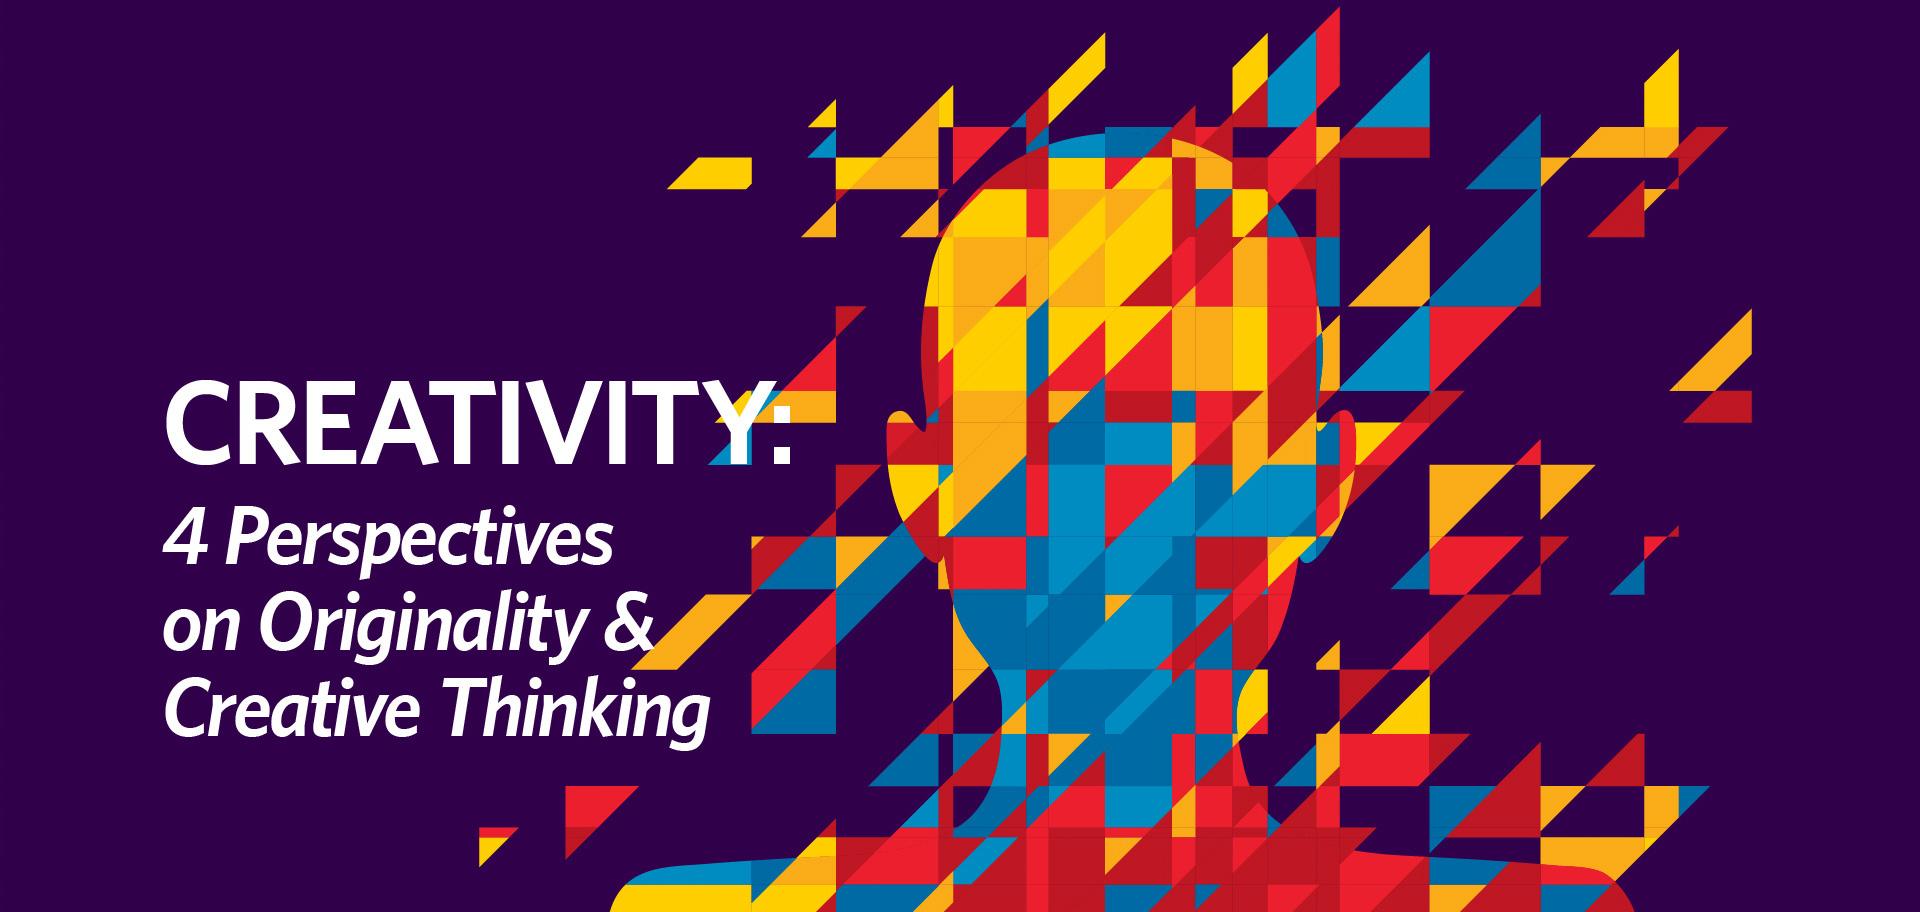 Creativity 4 perspectives on originality creative thinking Kettle Fire Creative blog creativity Creativity: 4 Perspectives on Originality and Creative Thinking creativity fi